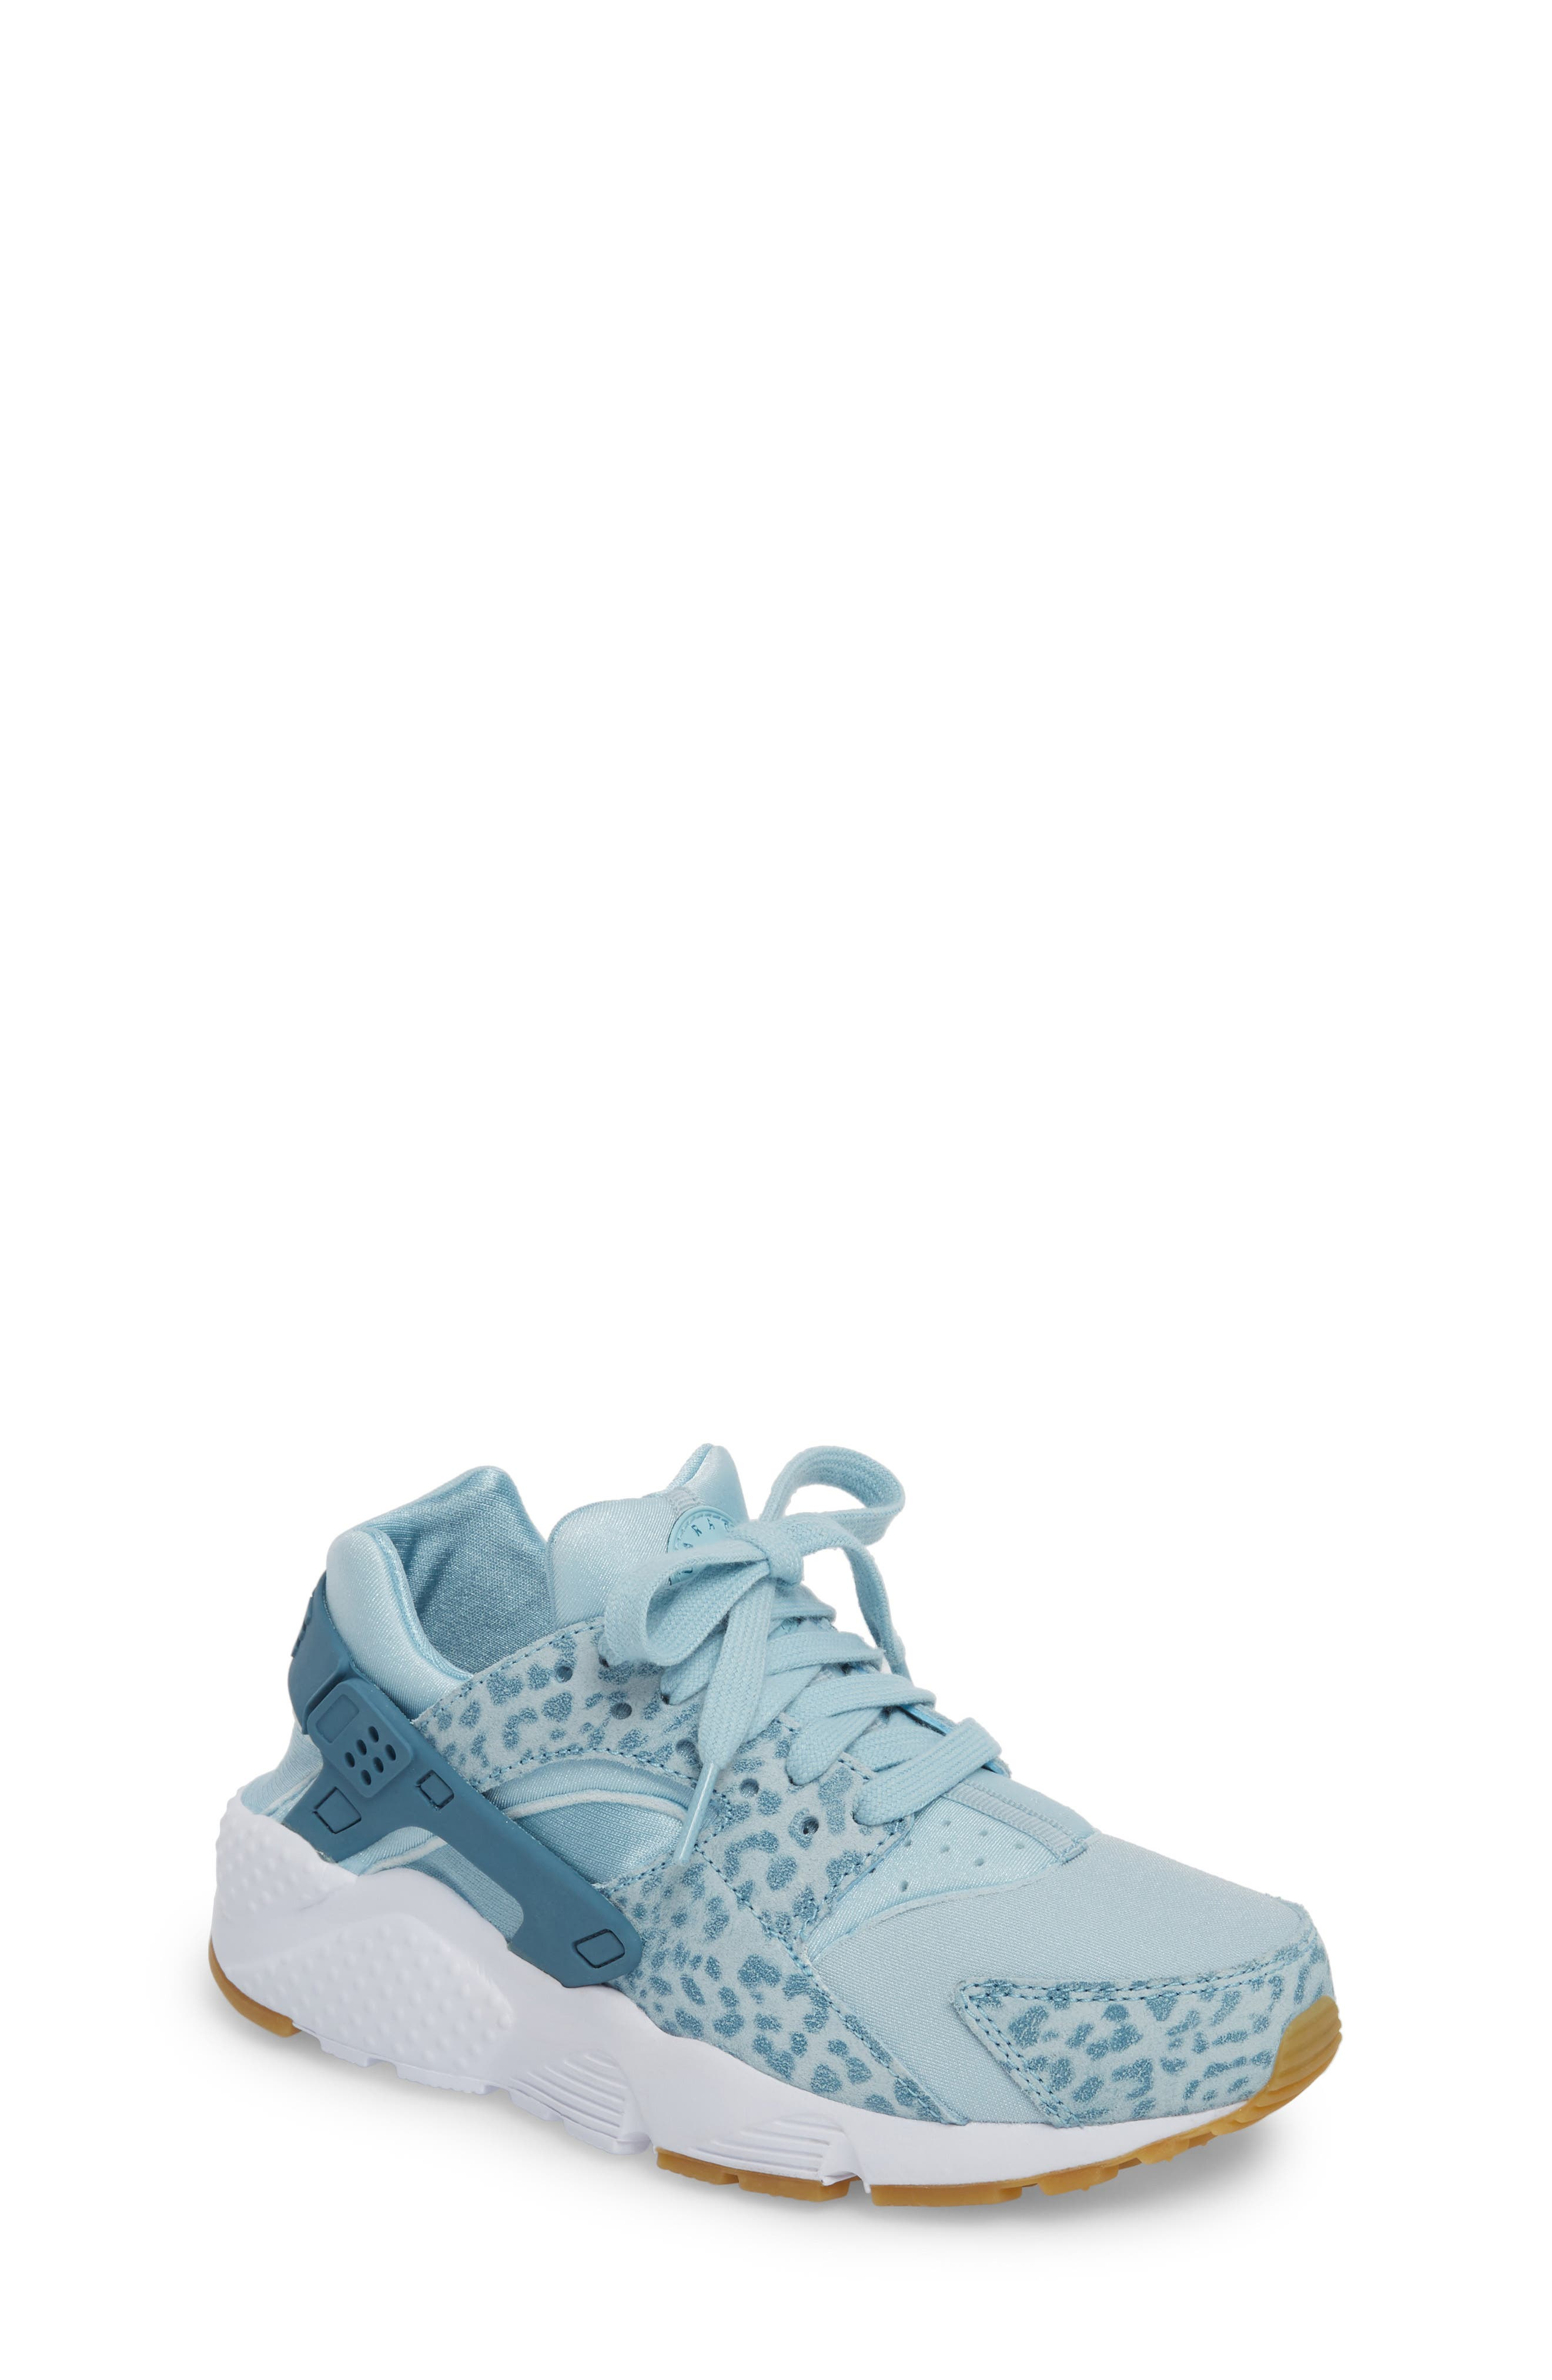 Main Image - Nike Huarache Run SE Sneaker (Baby, Walker, Toddler, Little Kid & Big Kid)